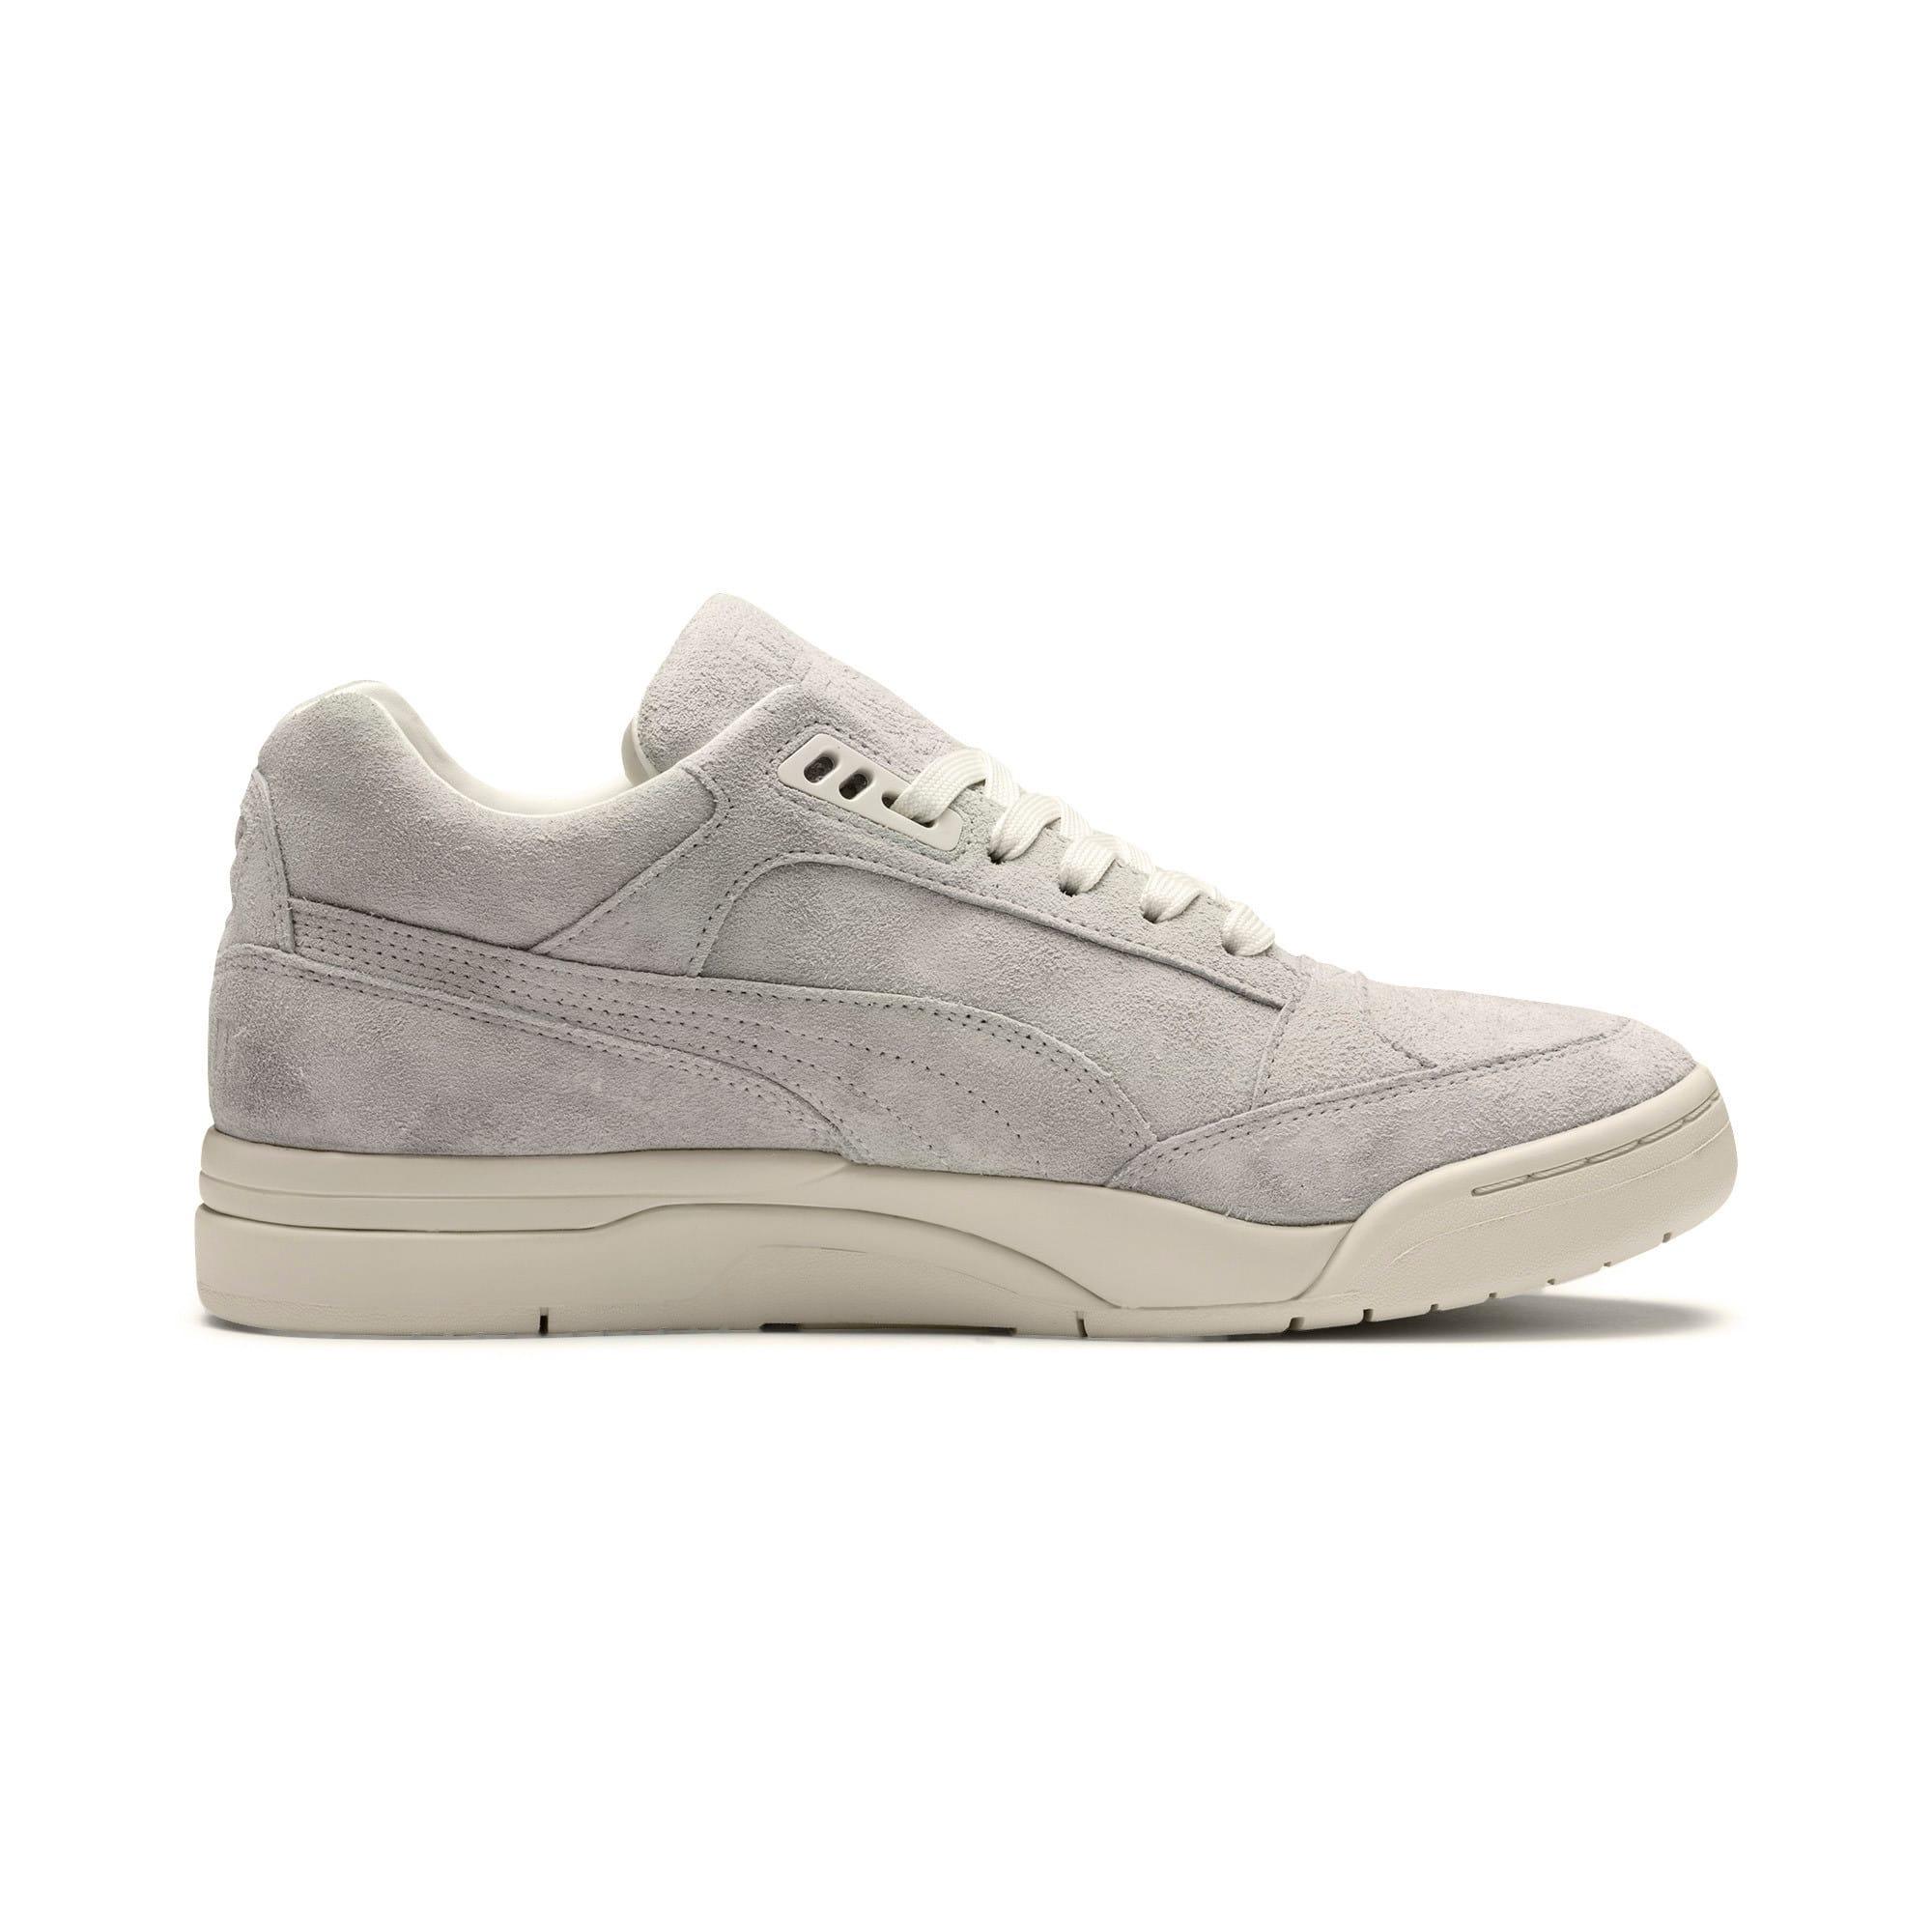 Thumbnail 5 of Palace Guard 4th of July Sneakers, Whisper White-Puma Black, medium